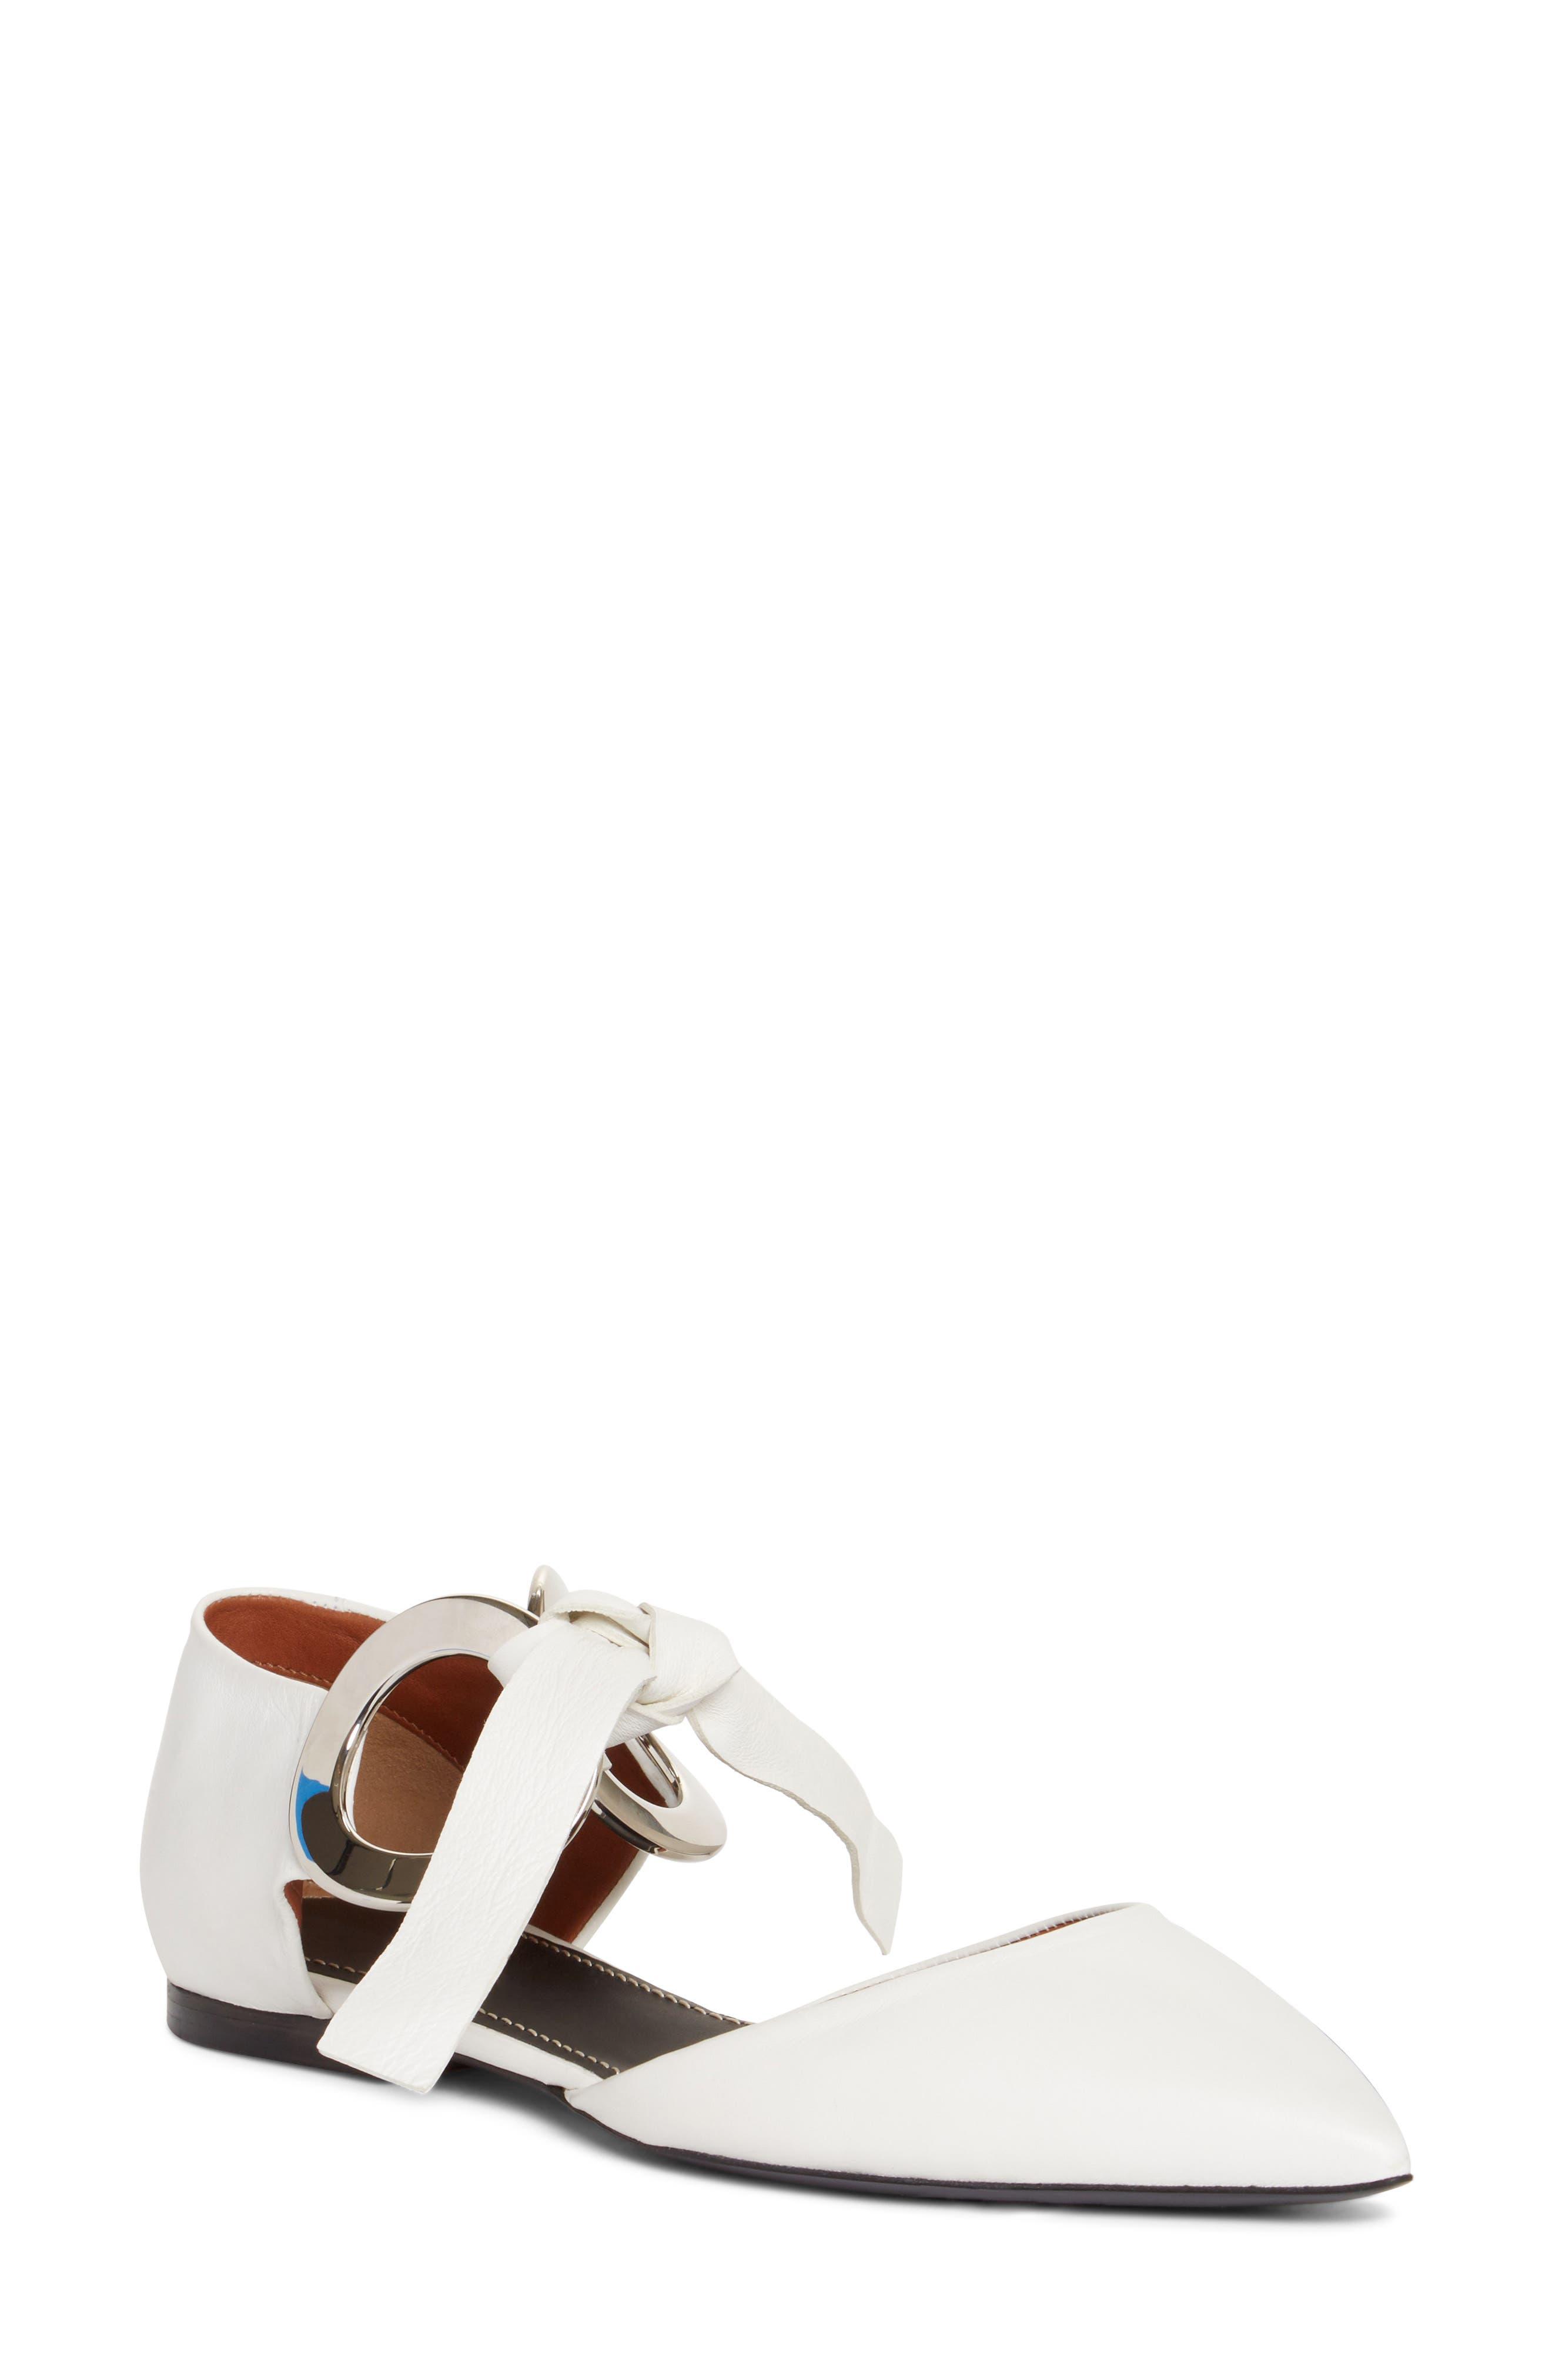 Proenza Schouler Lace-Up Pointy Toe Flat (Women)